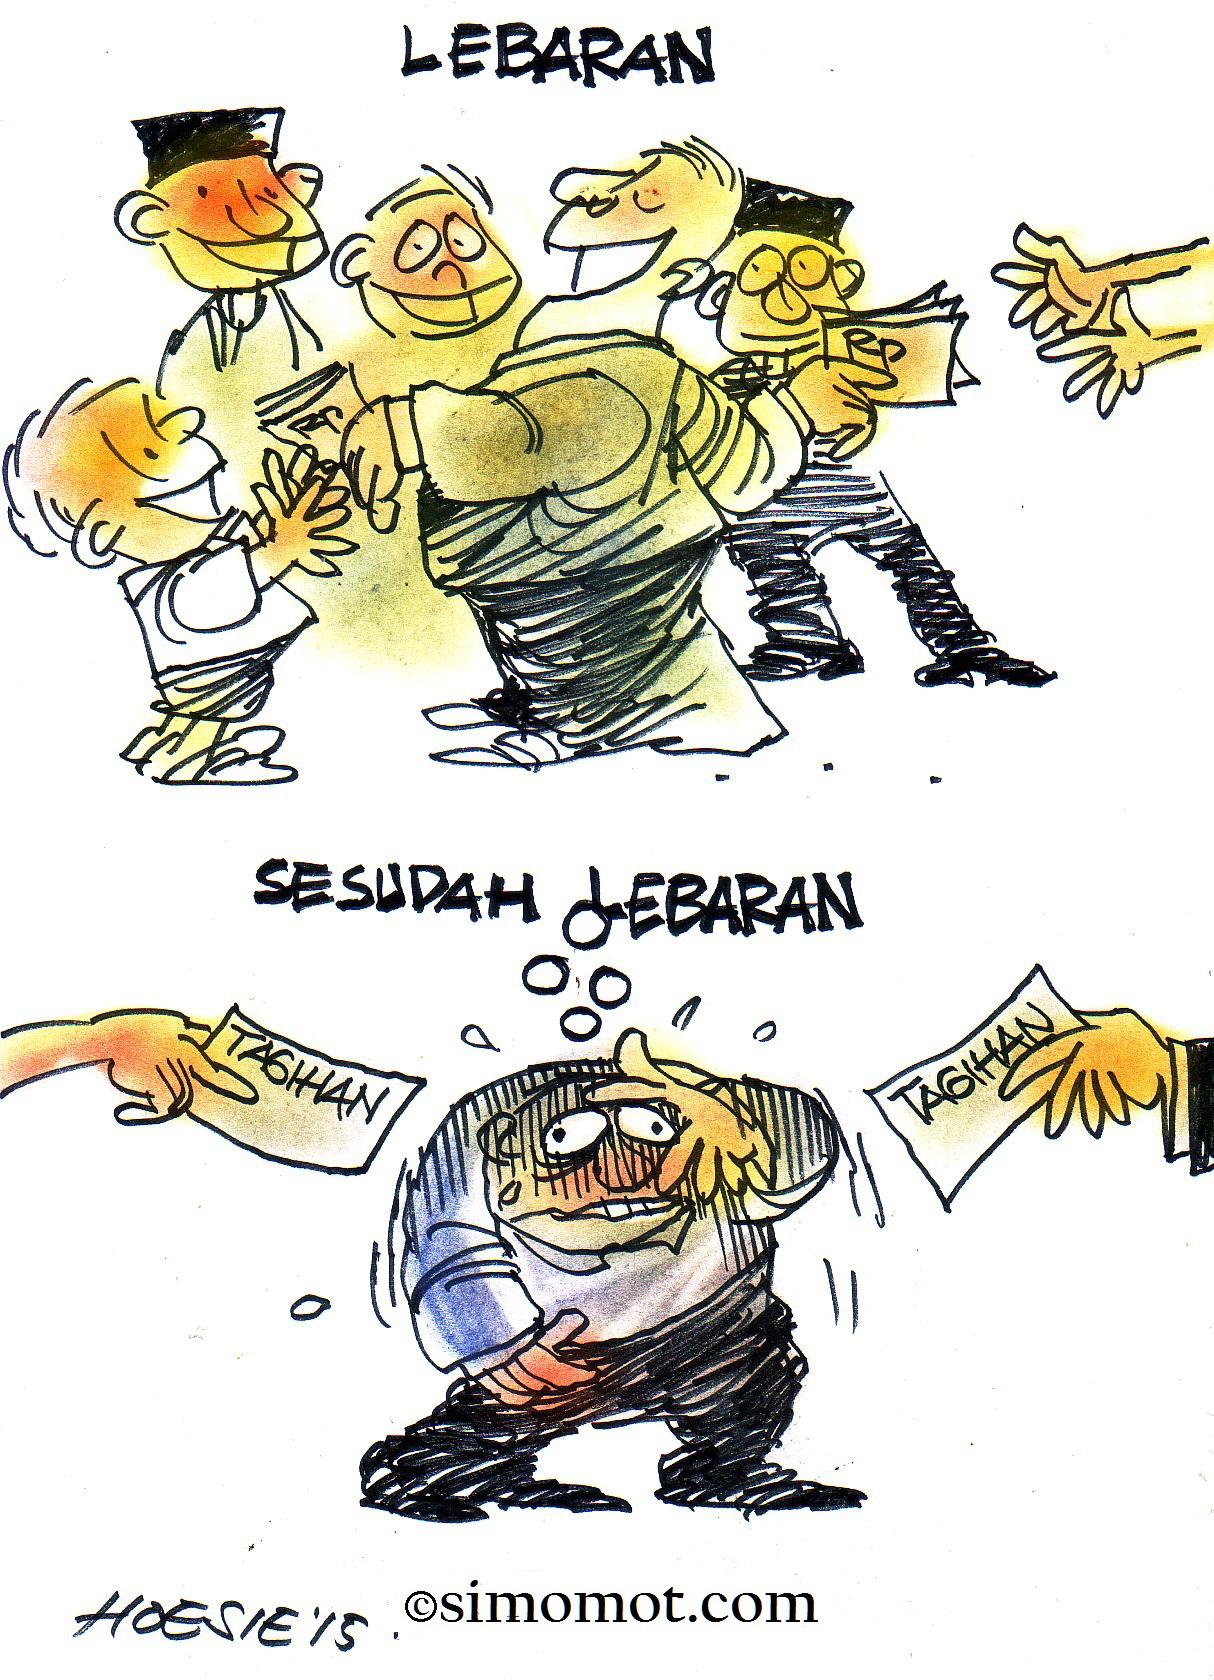 Lebaran Royal Pasca Lebaran Ngalir Tagihan Kartun Hari Ini